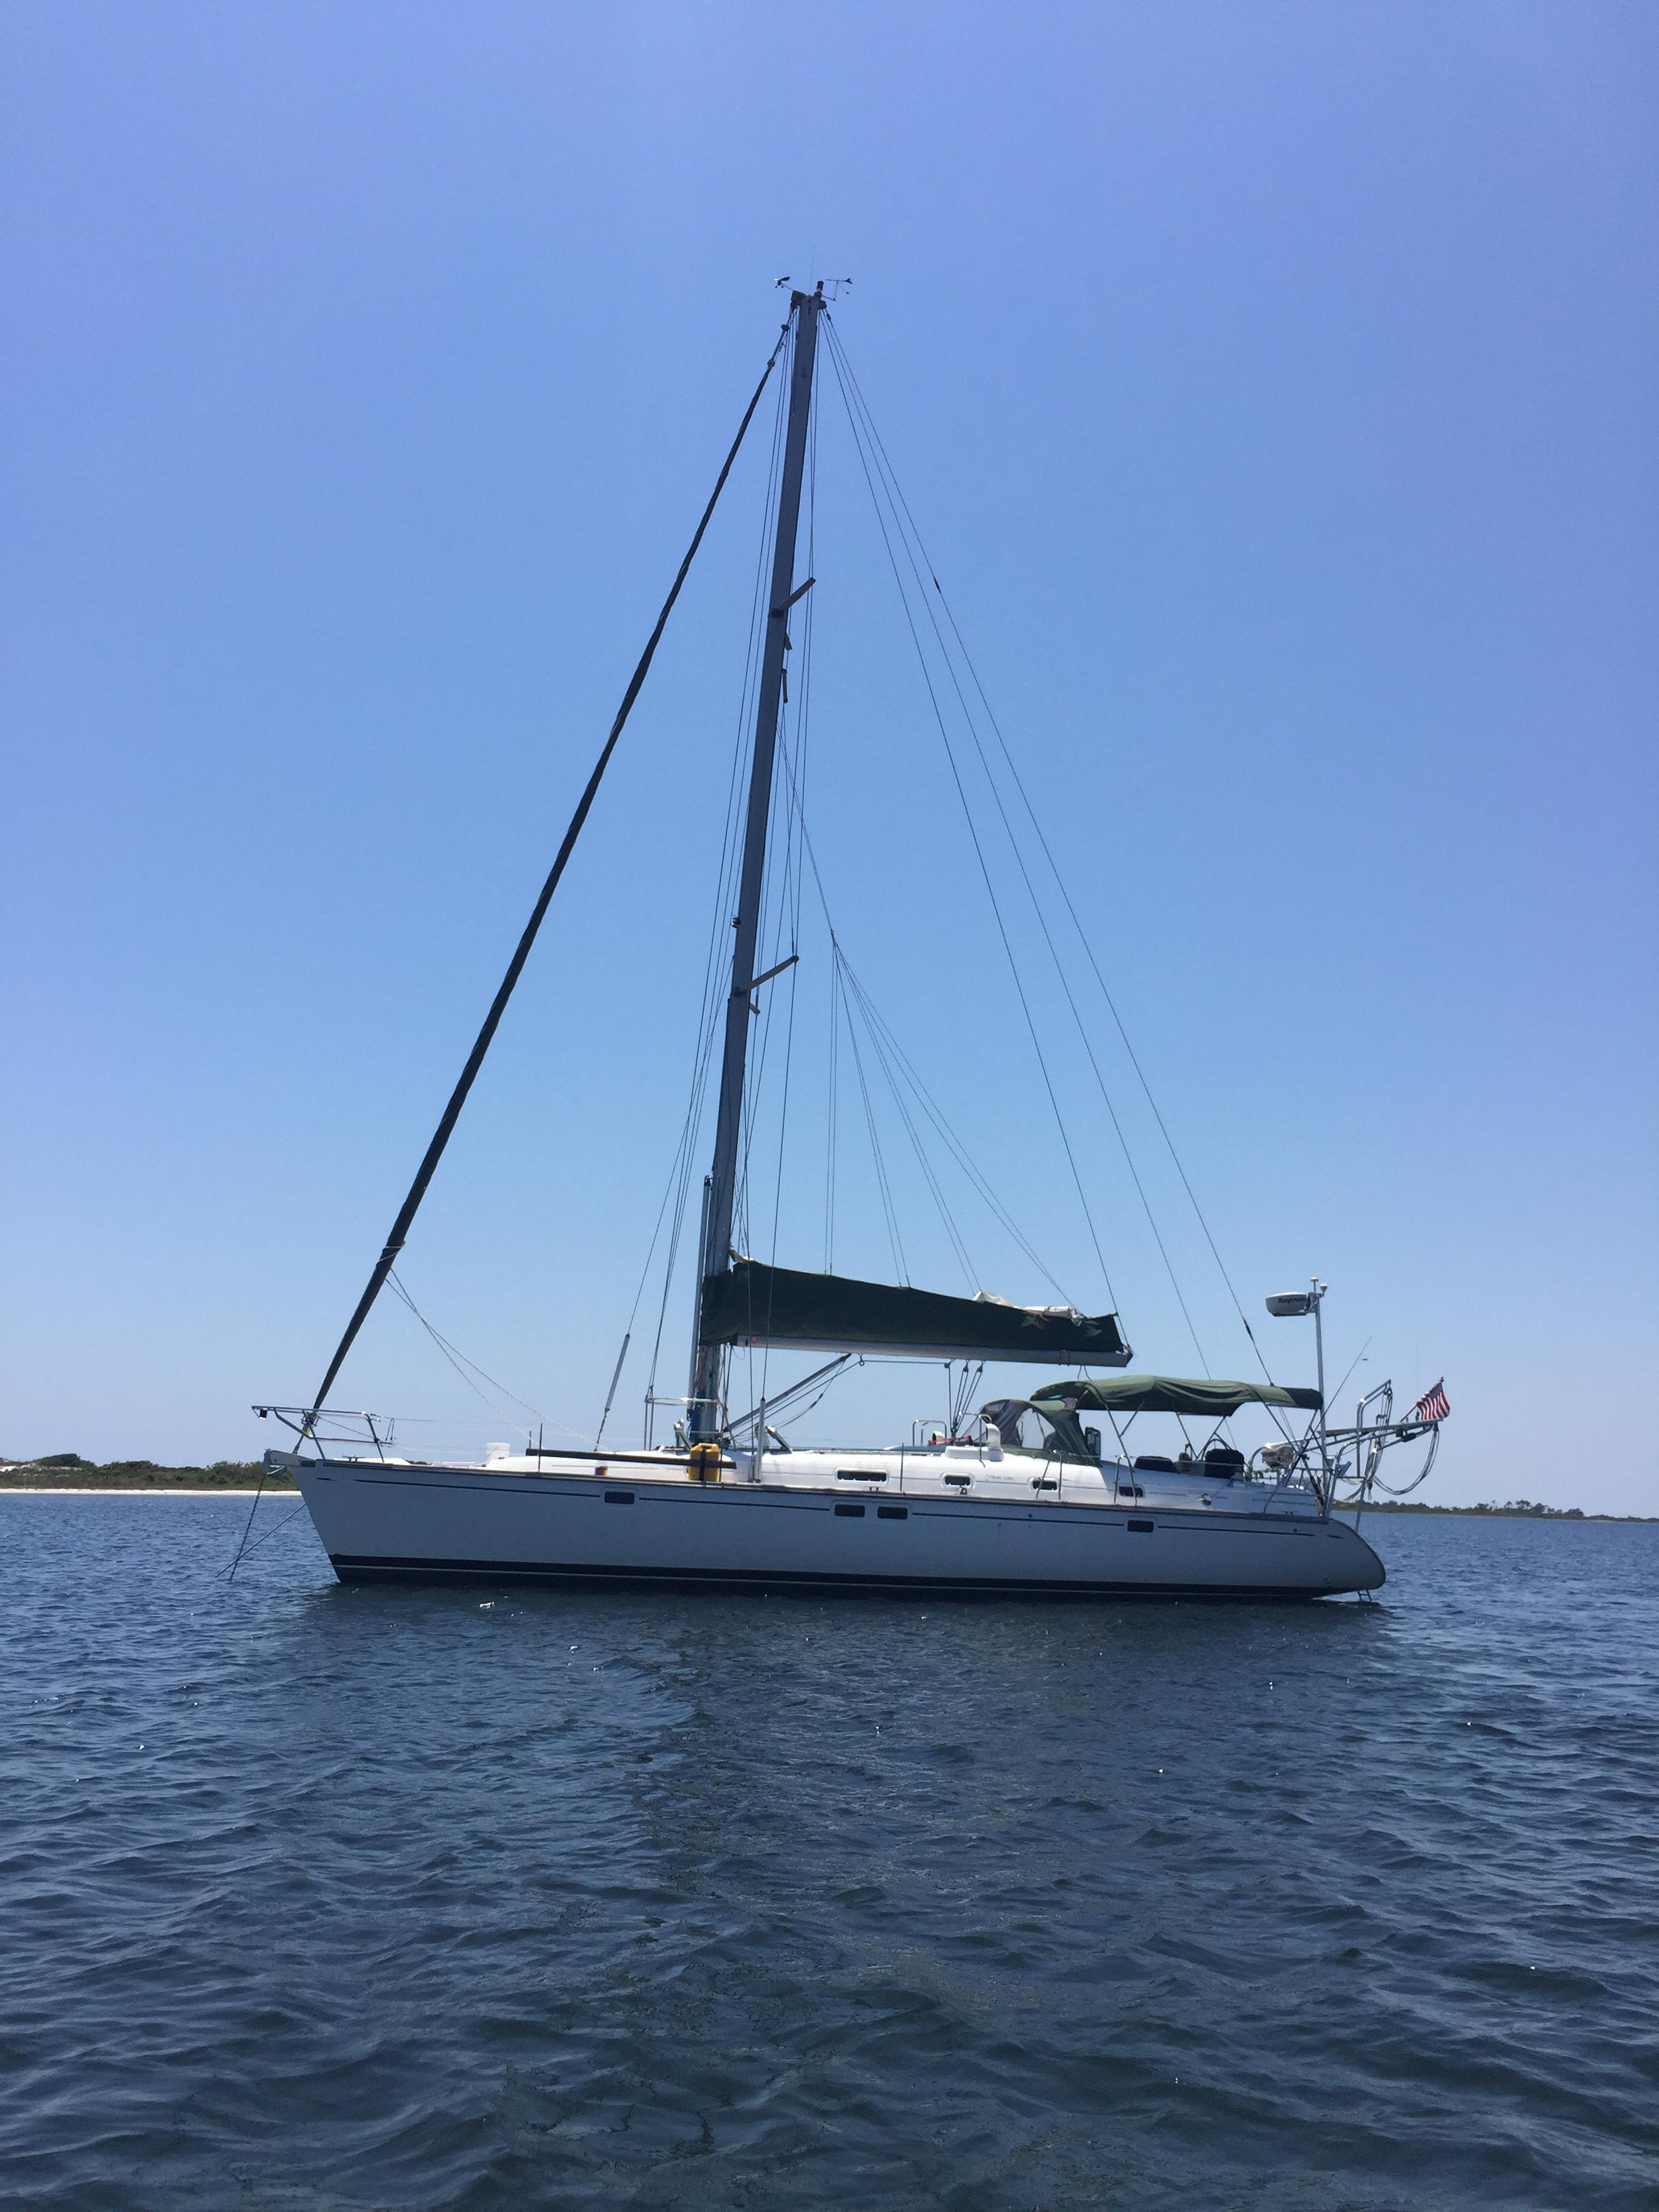 Beneteau Oceanis 461 Port side at anchor